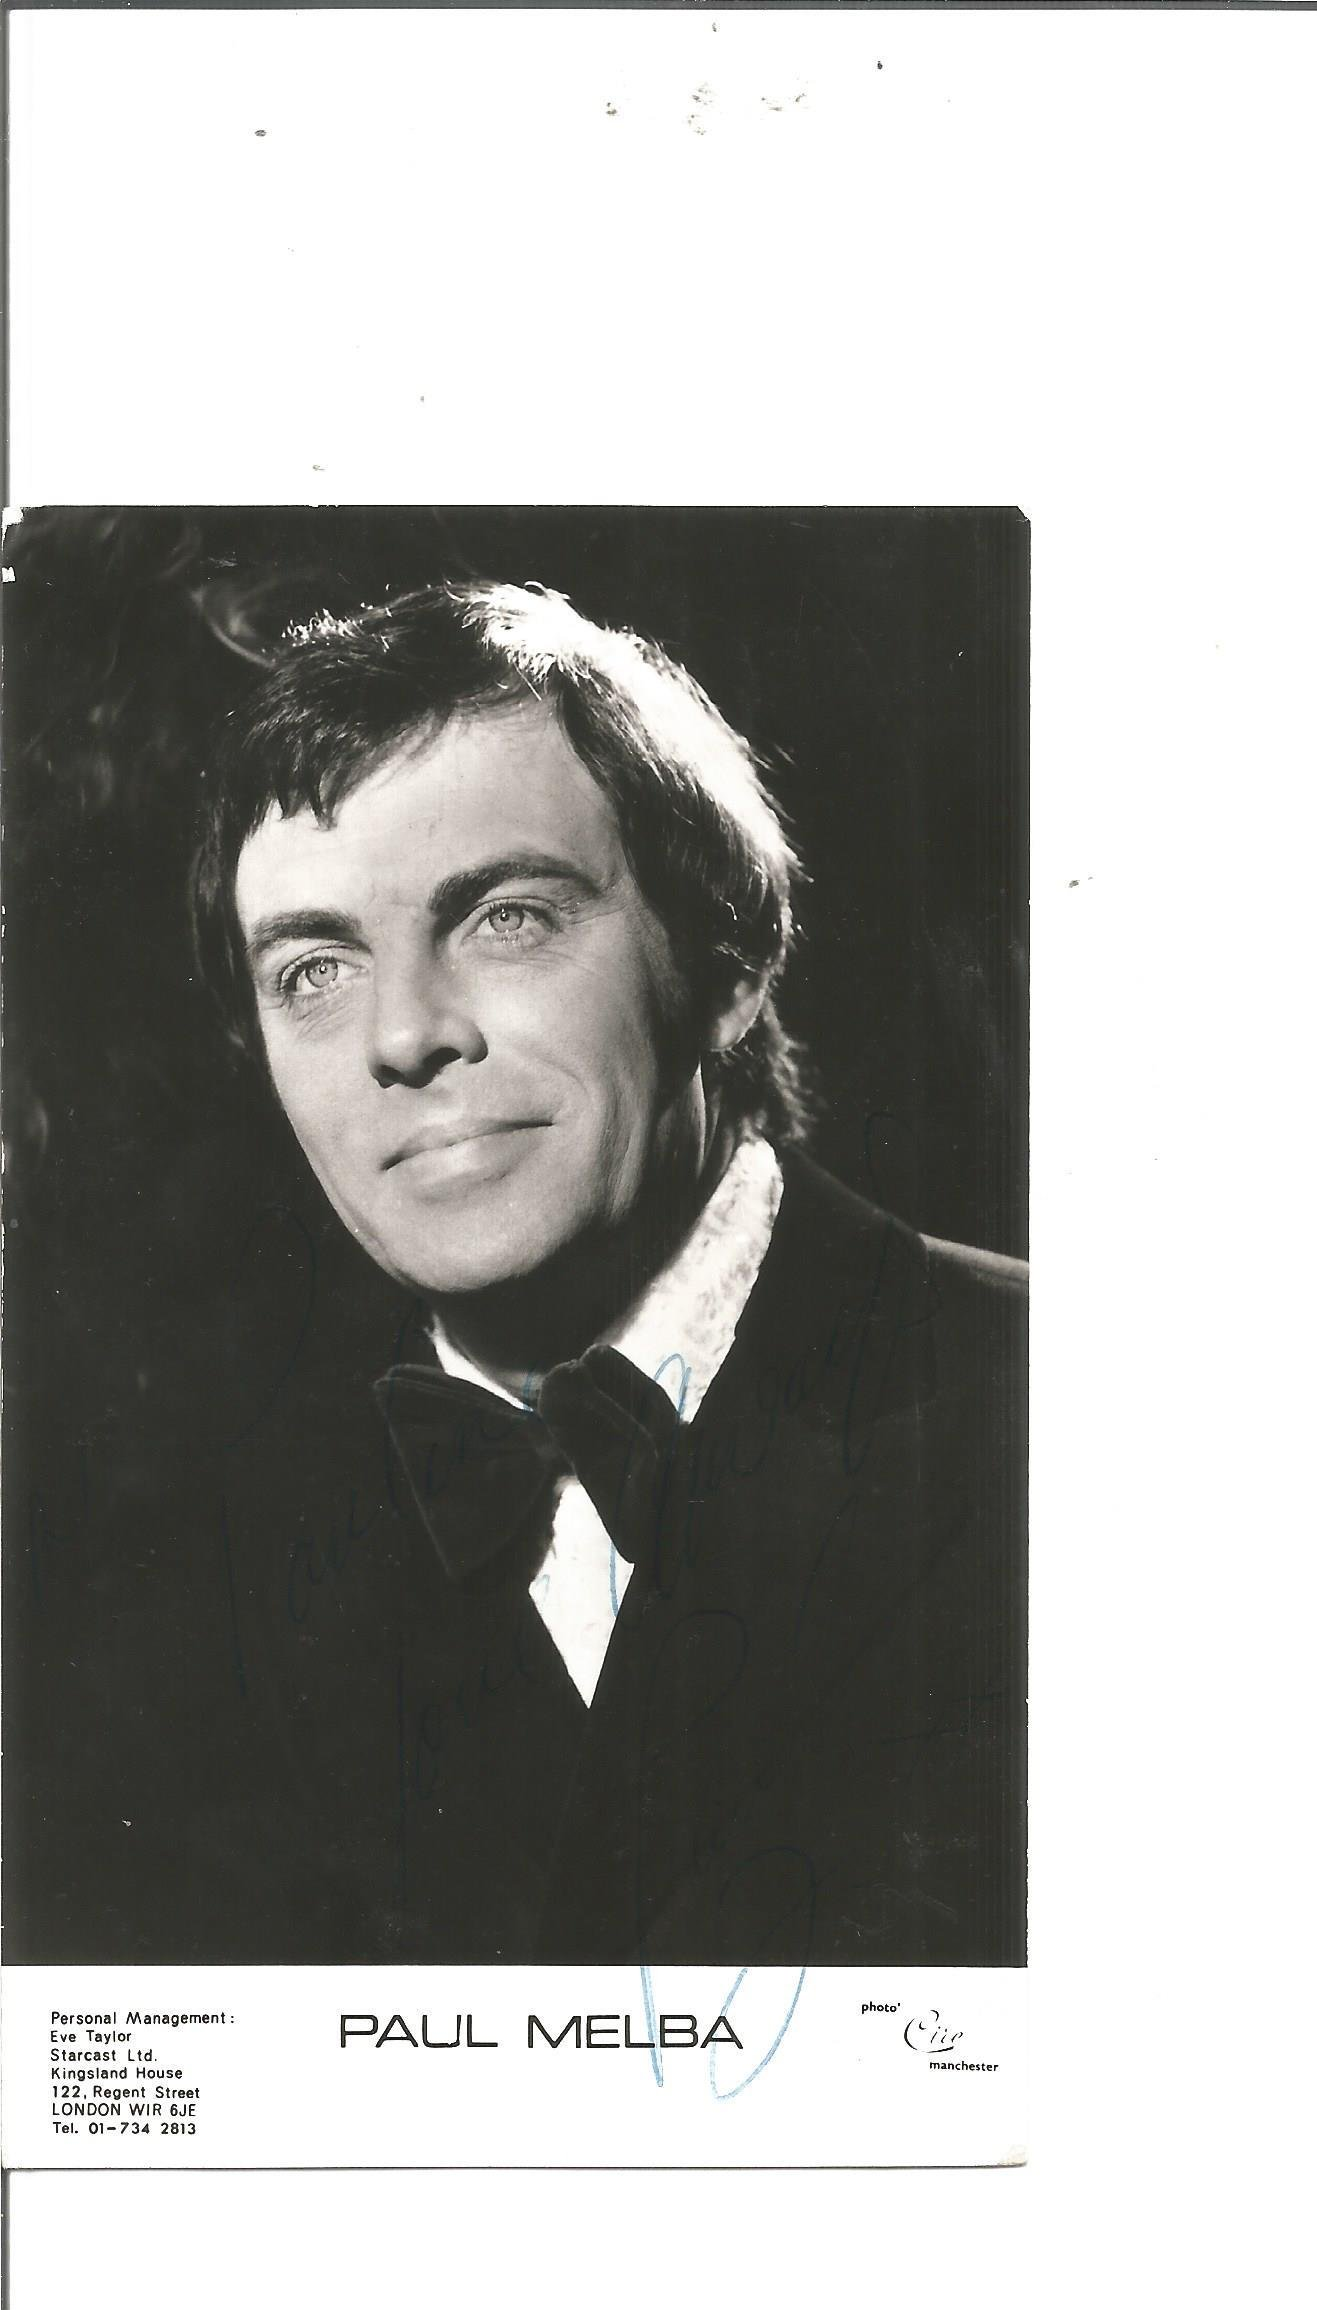 Paul Melba signed 6x3 black and white photo. Good